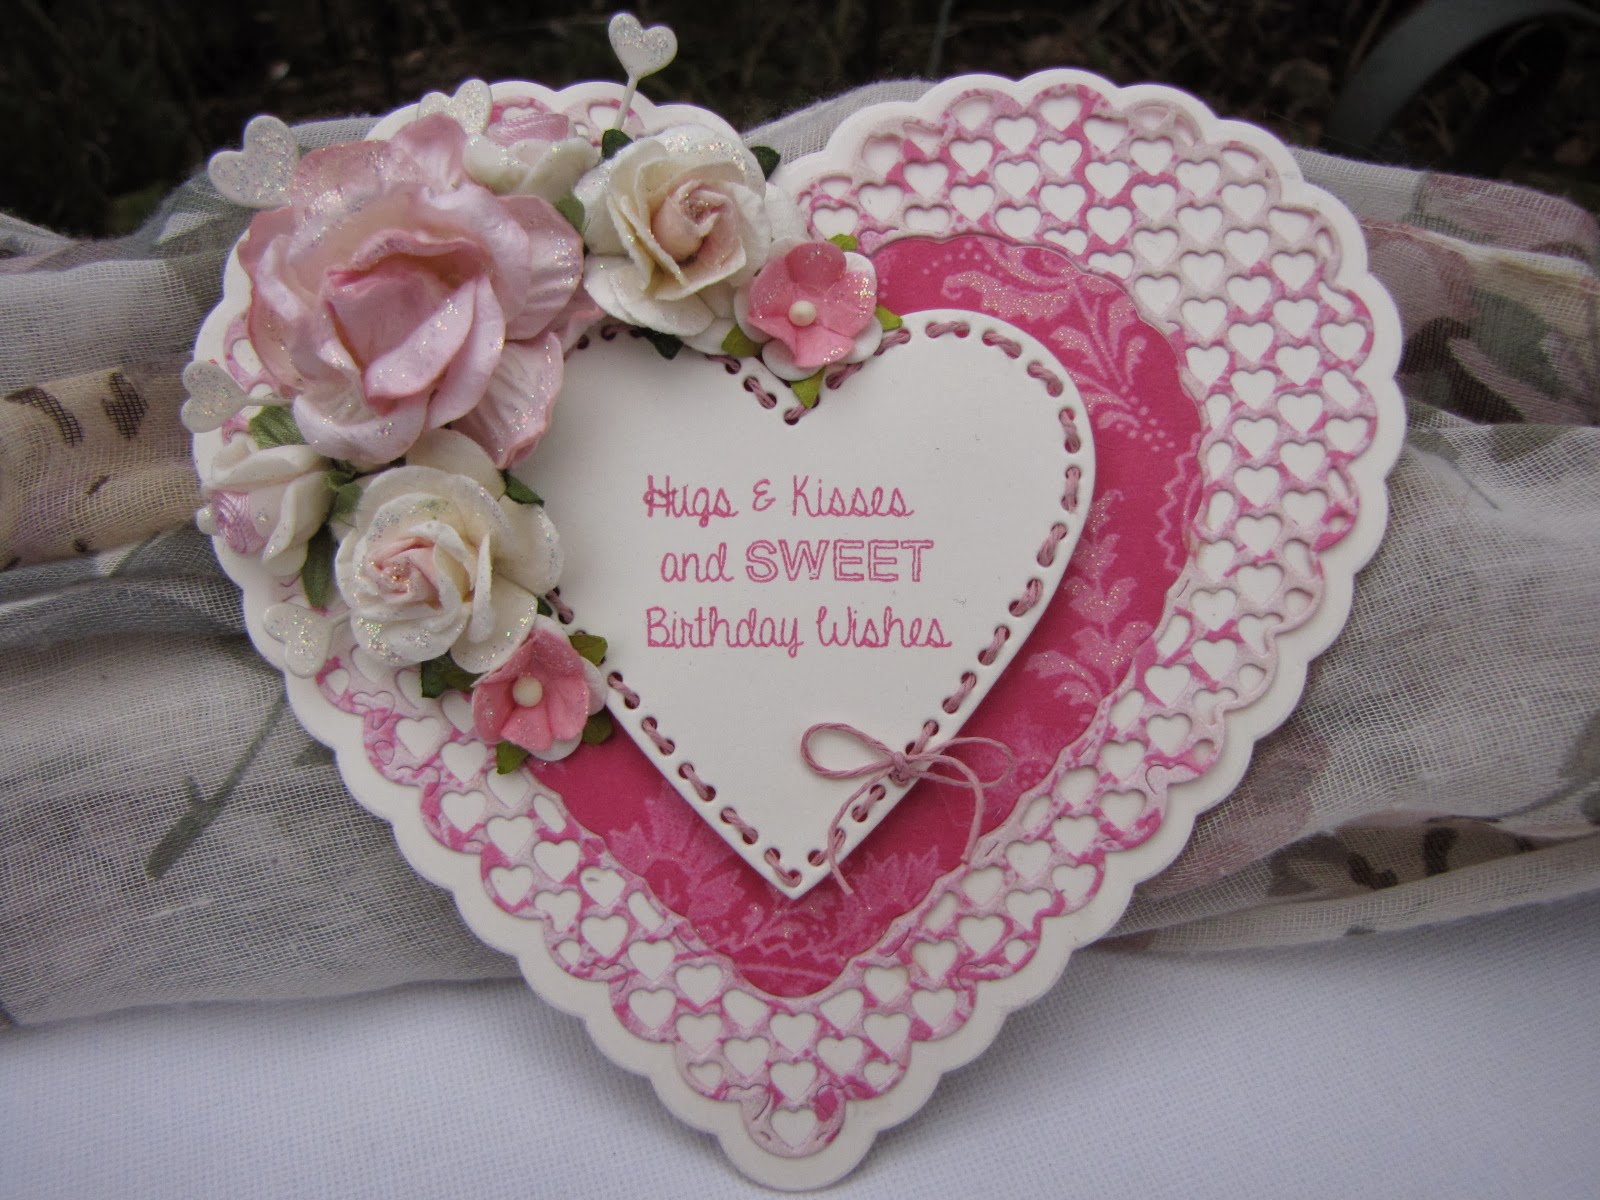 Handmade Cards Hearts i am on a Heart-shaped Card